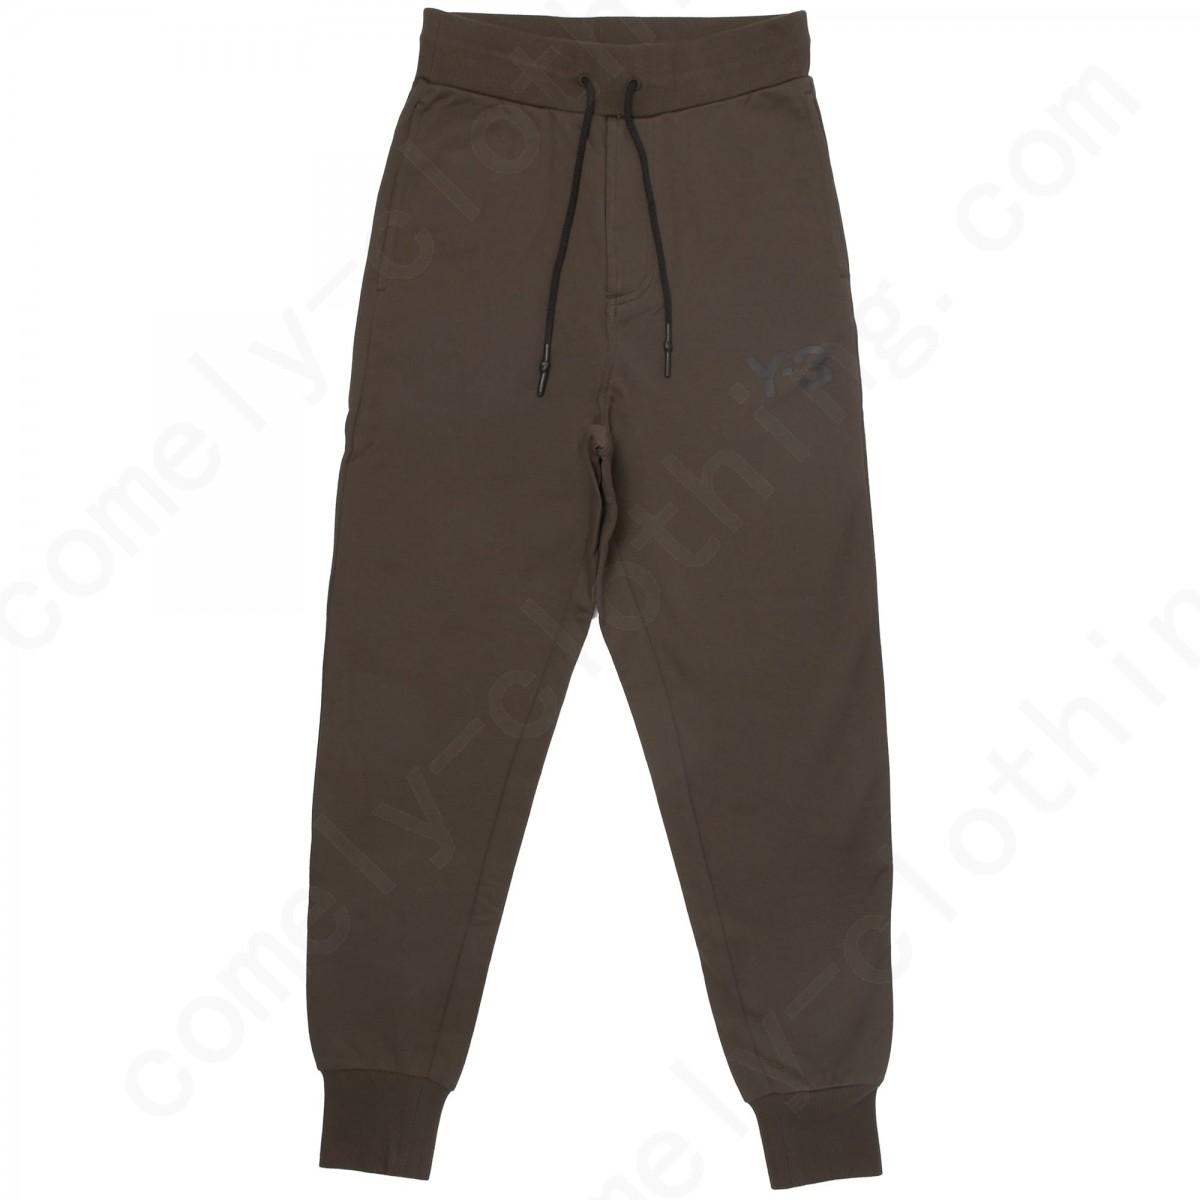 Adidas Y-3 Classic Cuffed Track Pants - Olive Men - -0